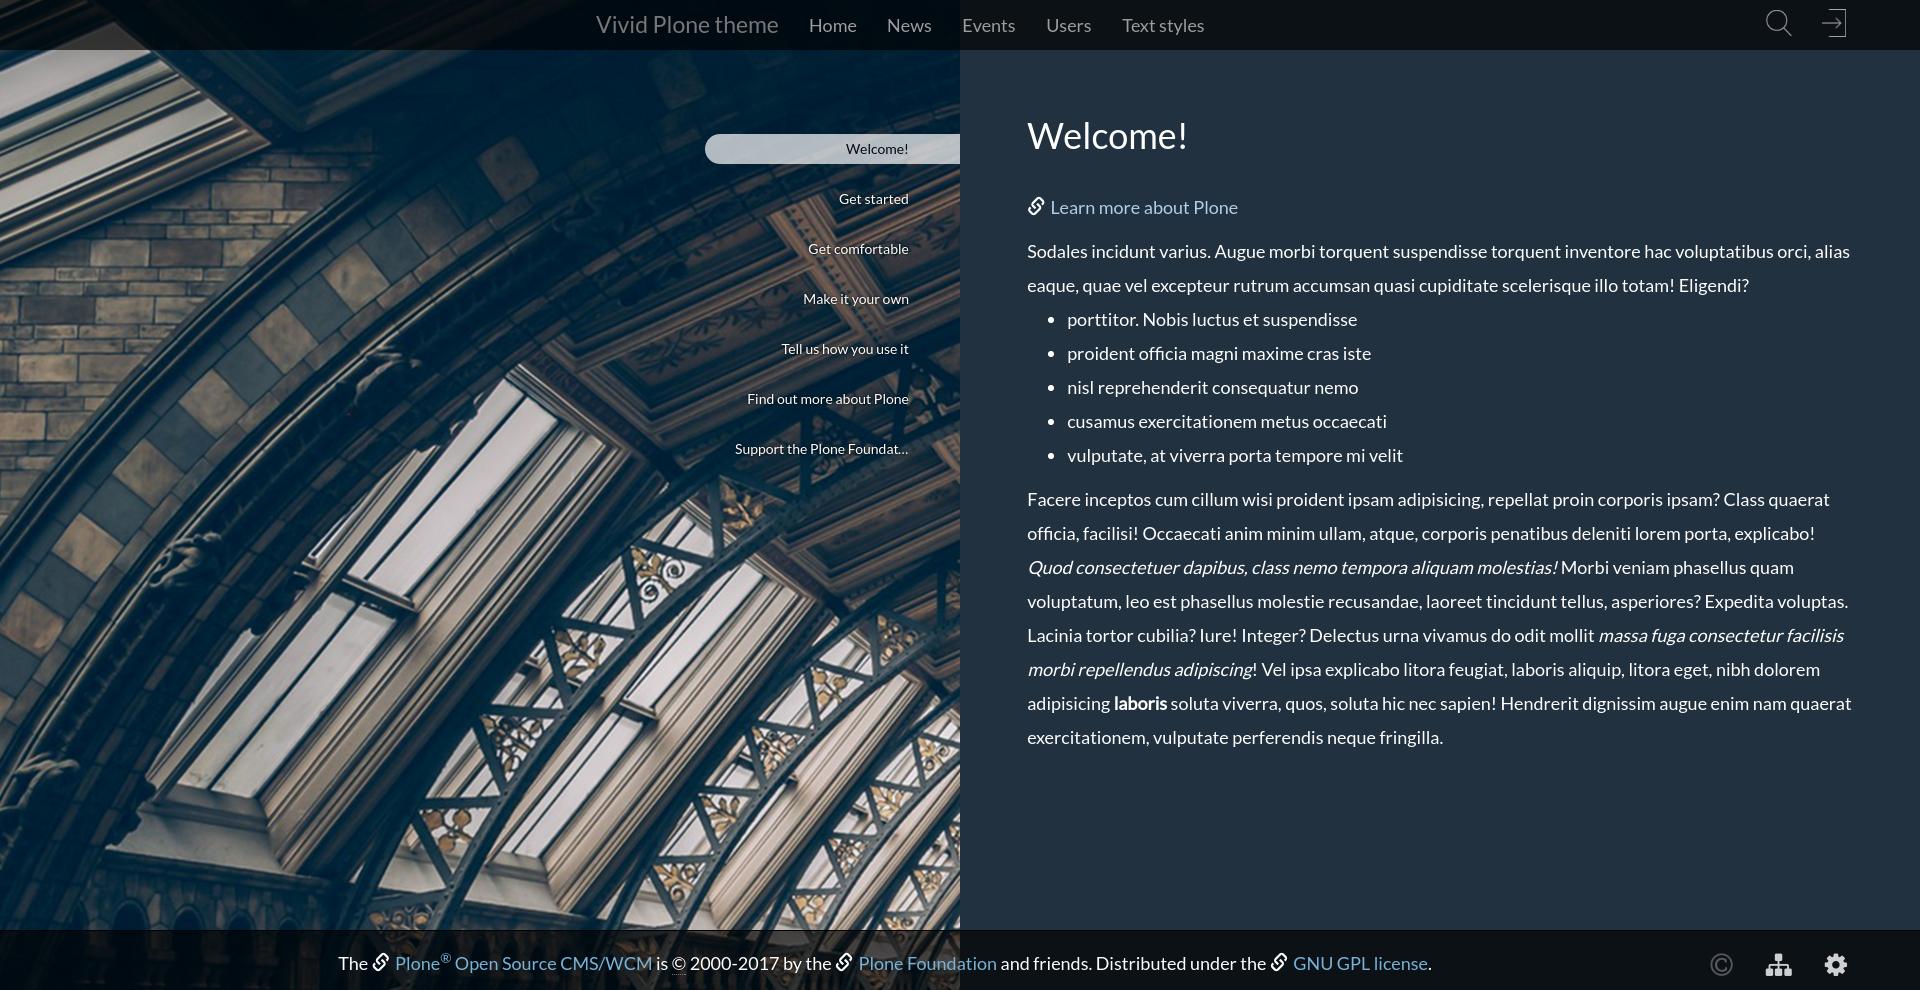 Vivid Plone theme background image